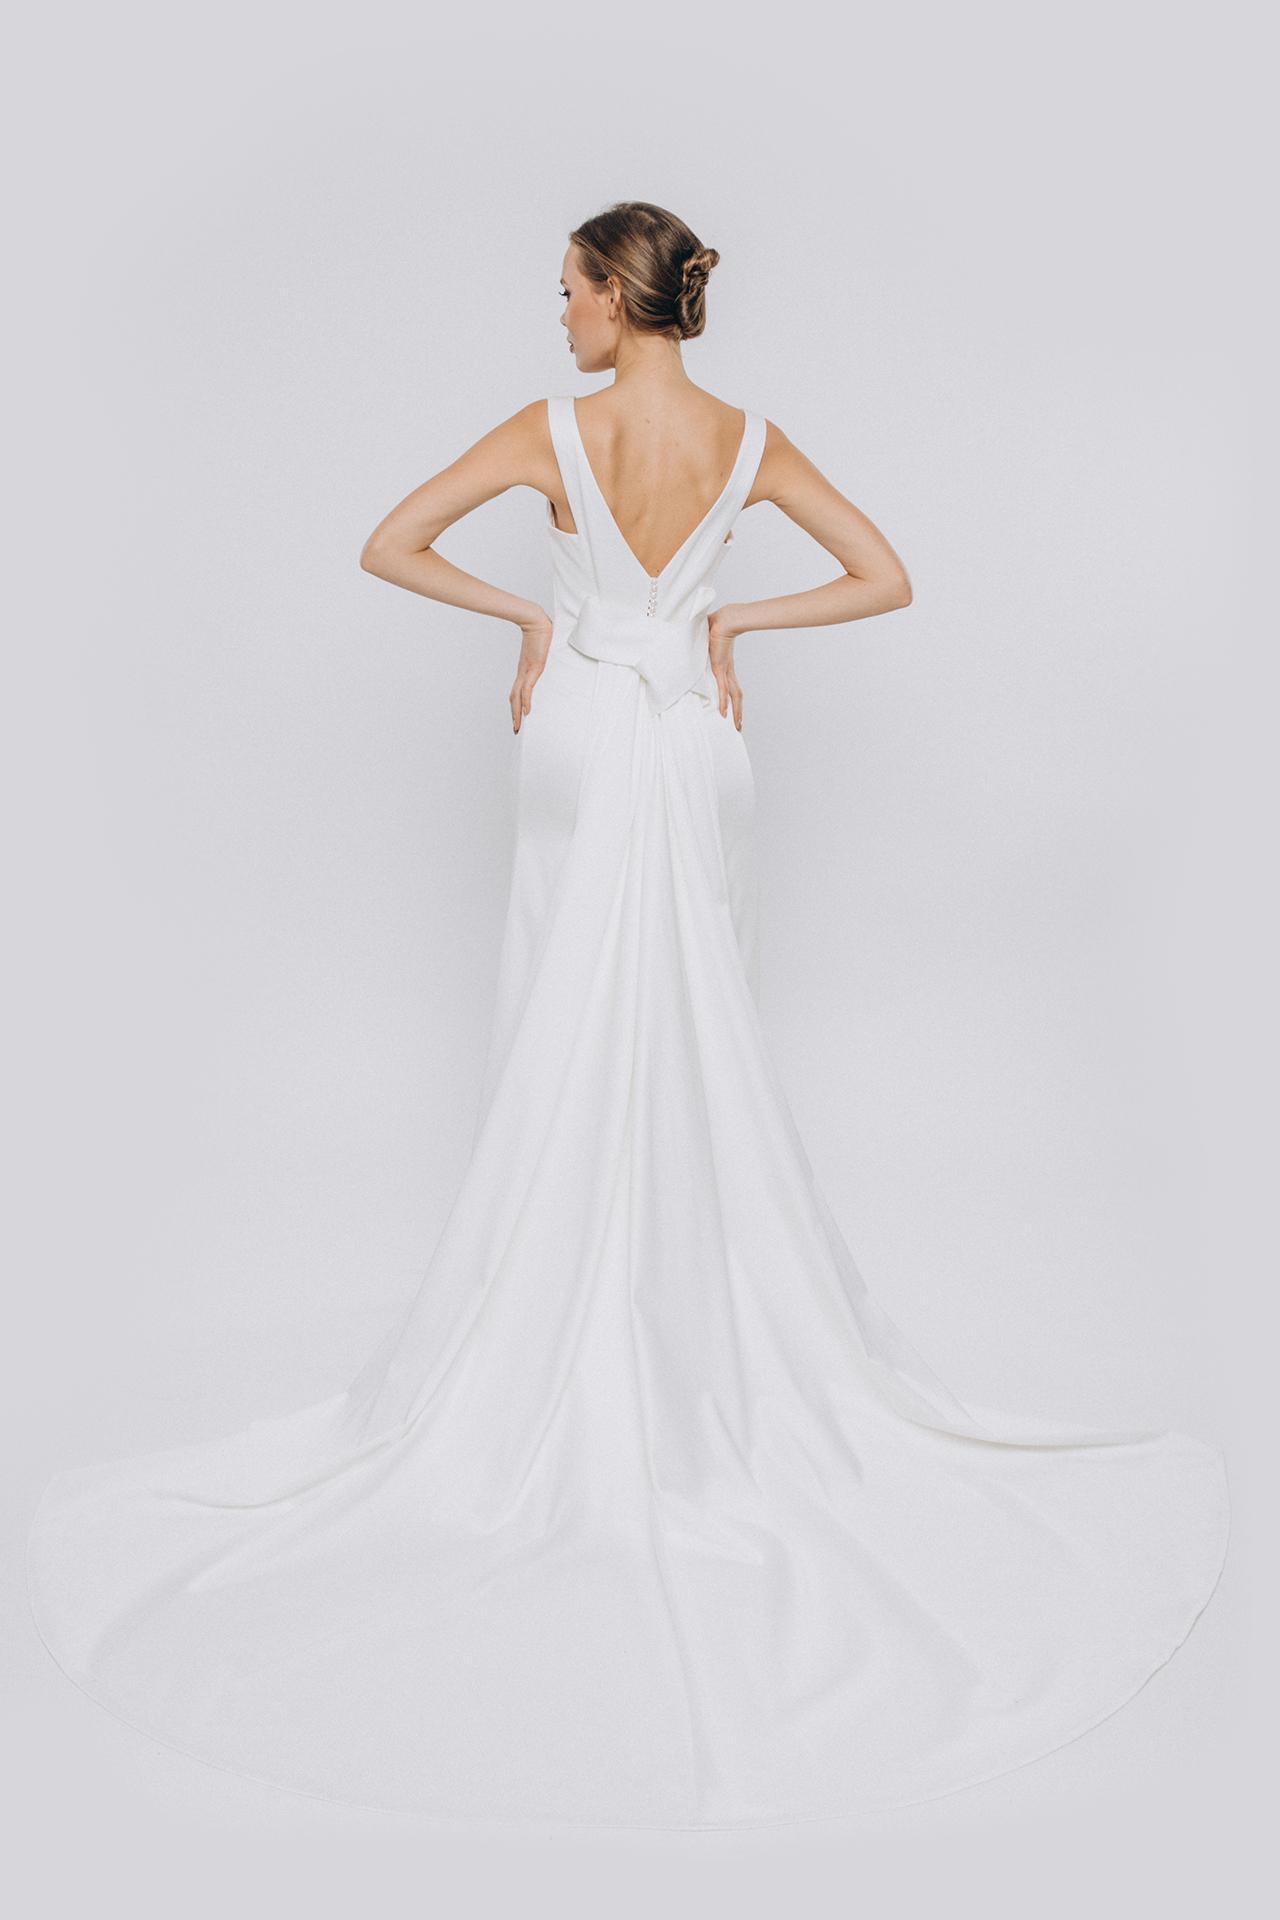 Romantic White Wedding Dress Elegant Mermaid Wedding Gown Modern Bridal Dress 2020 Mermaid Brocade Wedding Dress Sesilia Pearl Fashion Group,Summer Elegant Pakistani Wedding Guest Dresses